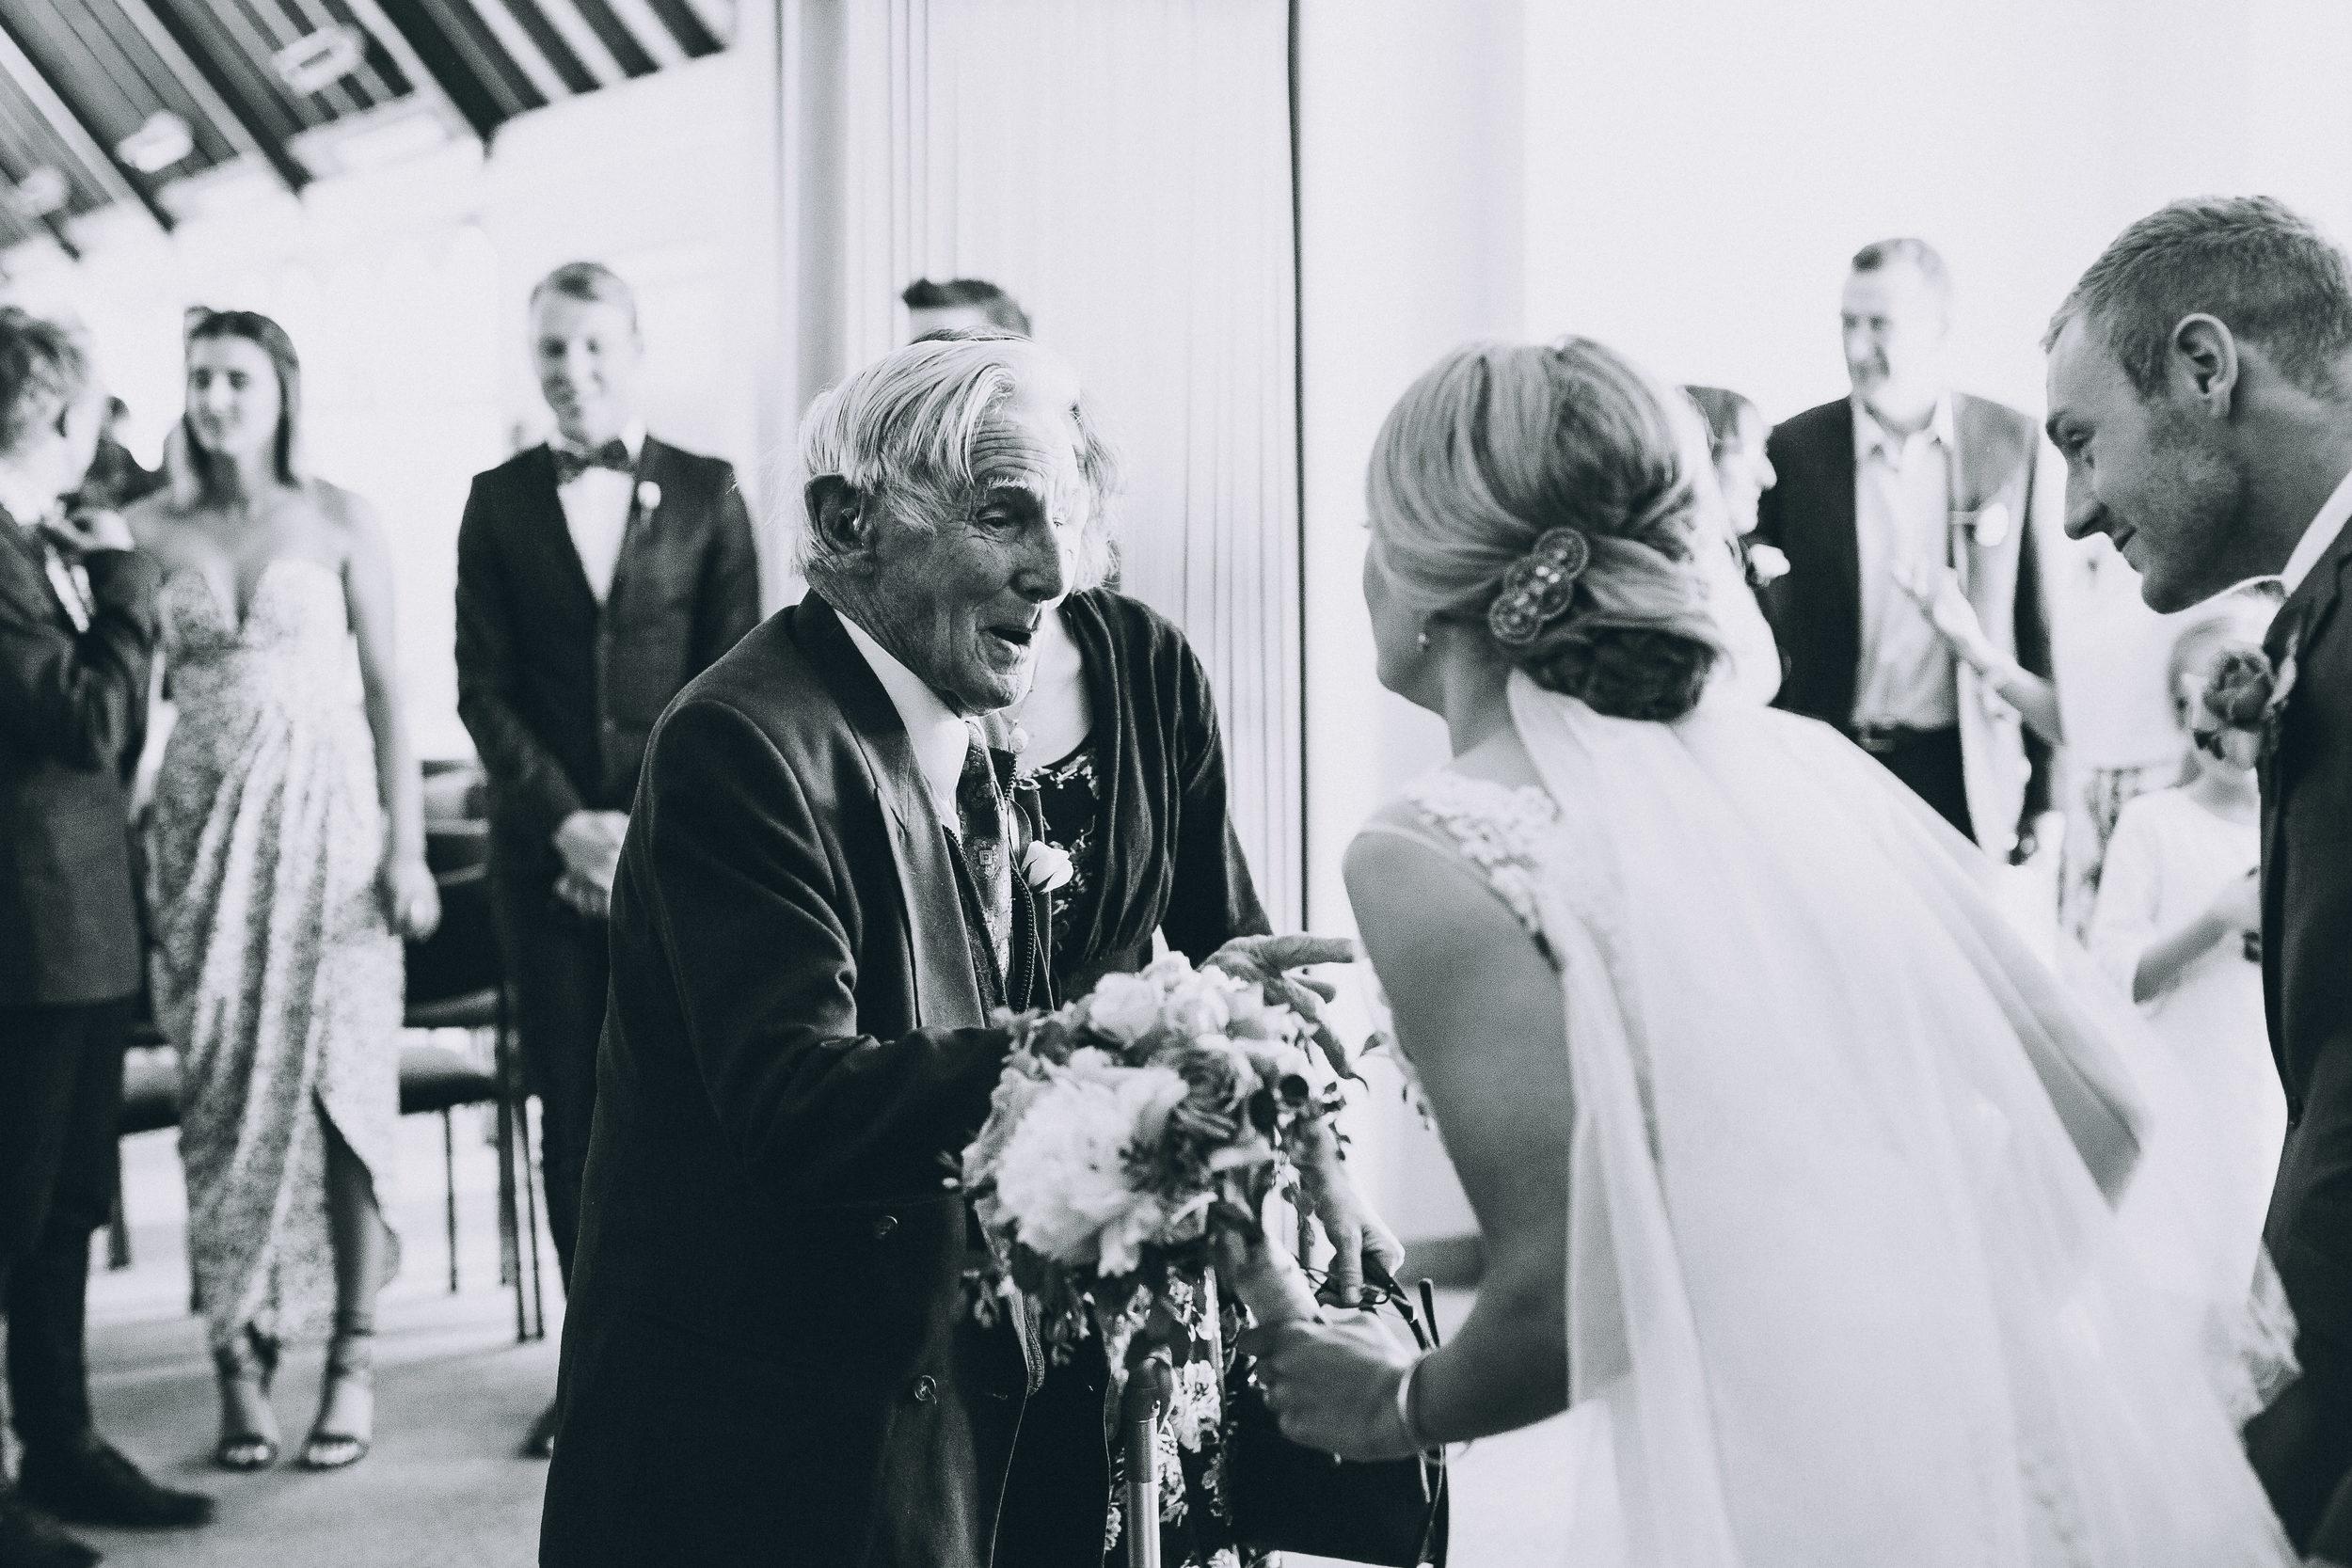 Shivonne & James - Ceremony Monochrome-256.jpg